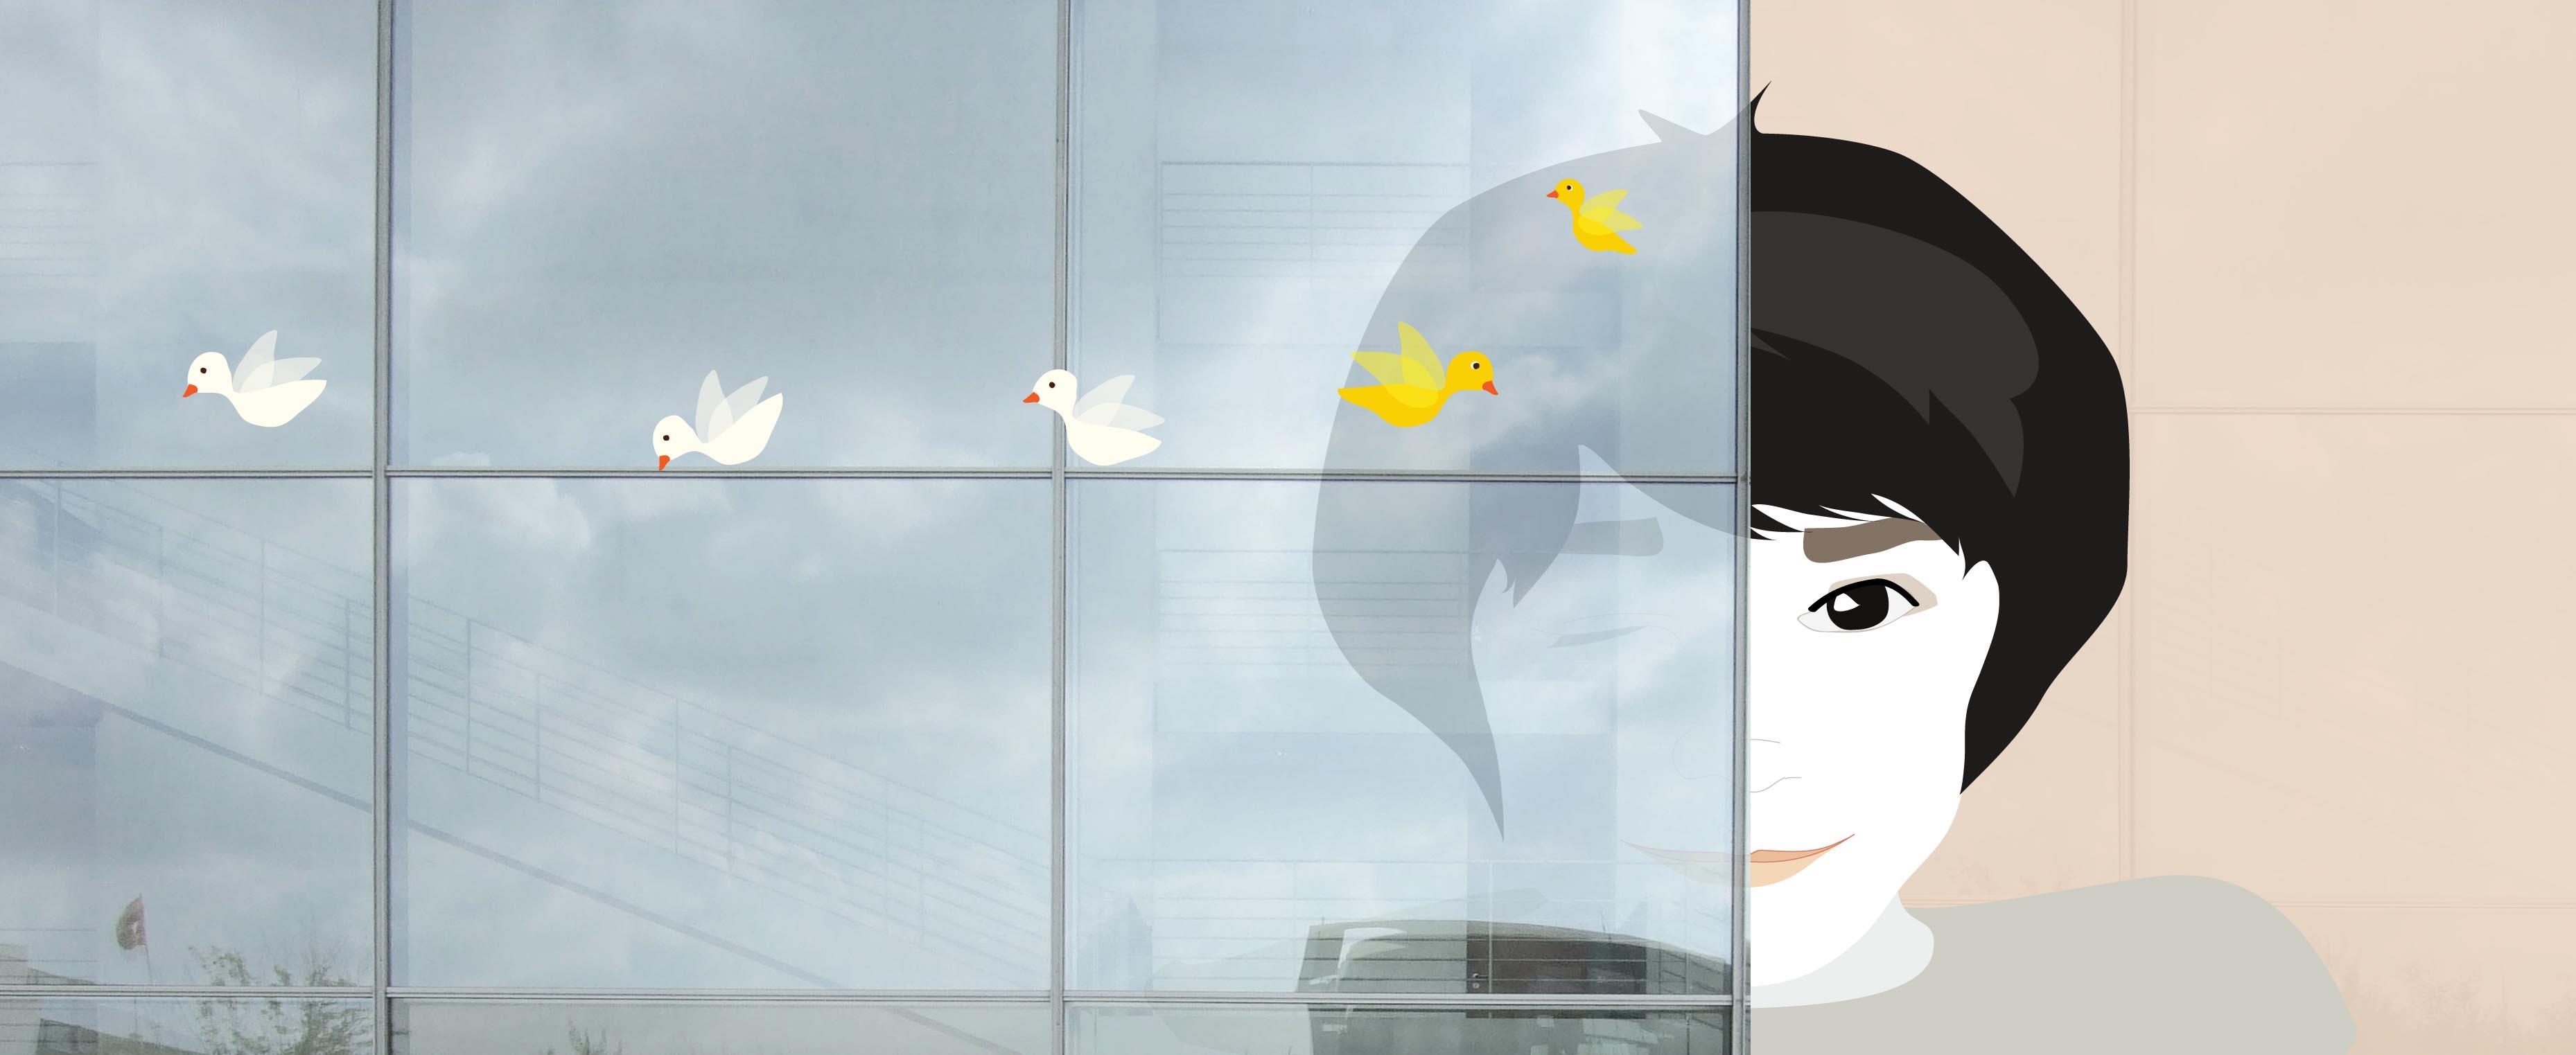 Ada Popescu illustration &graphic design portraits, editorial, storytelling